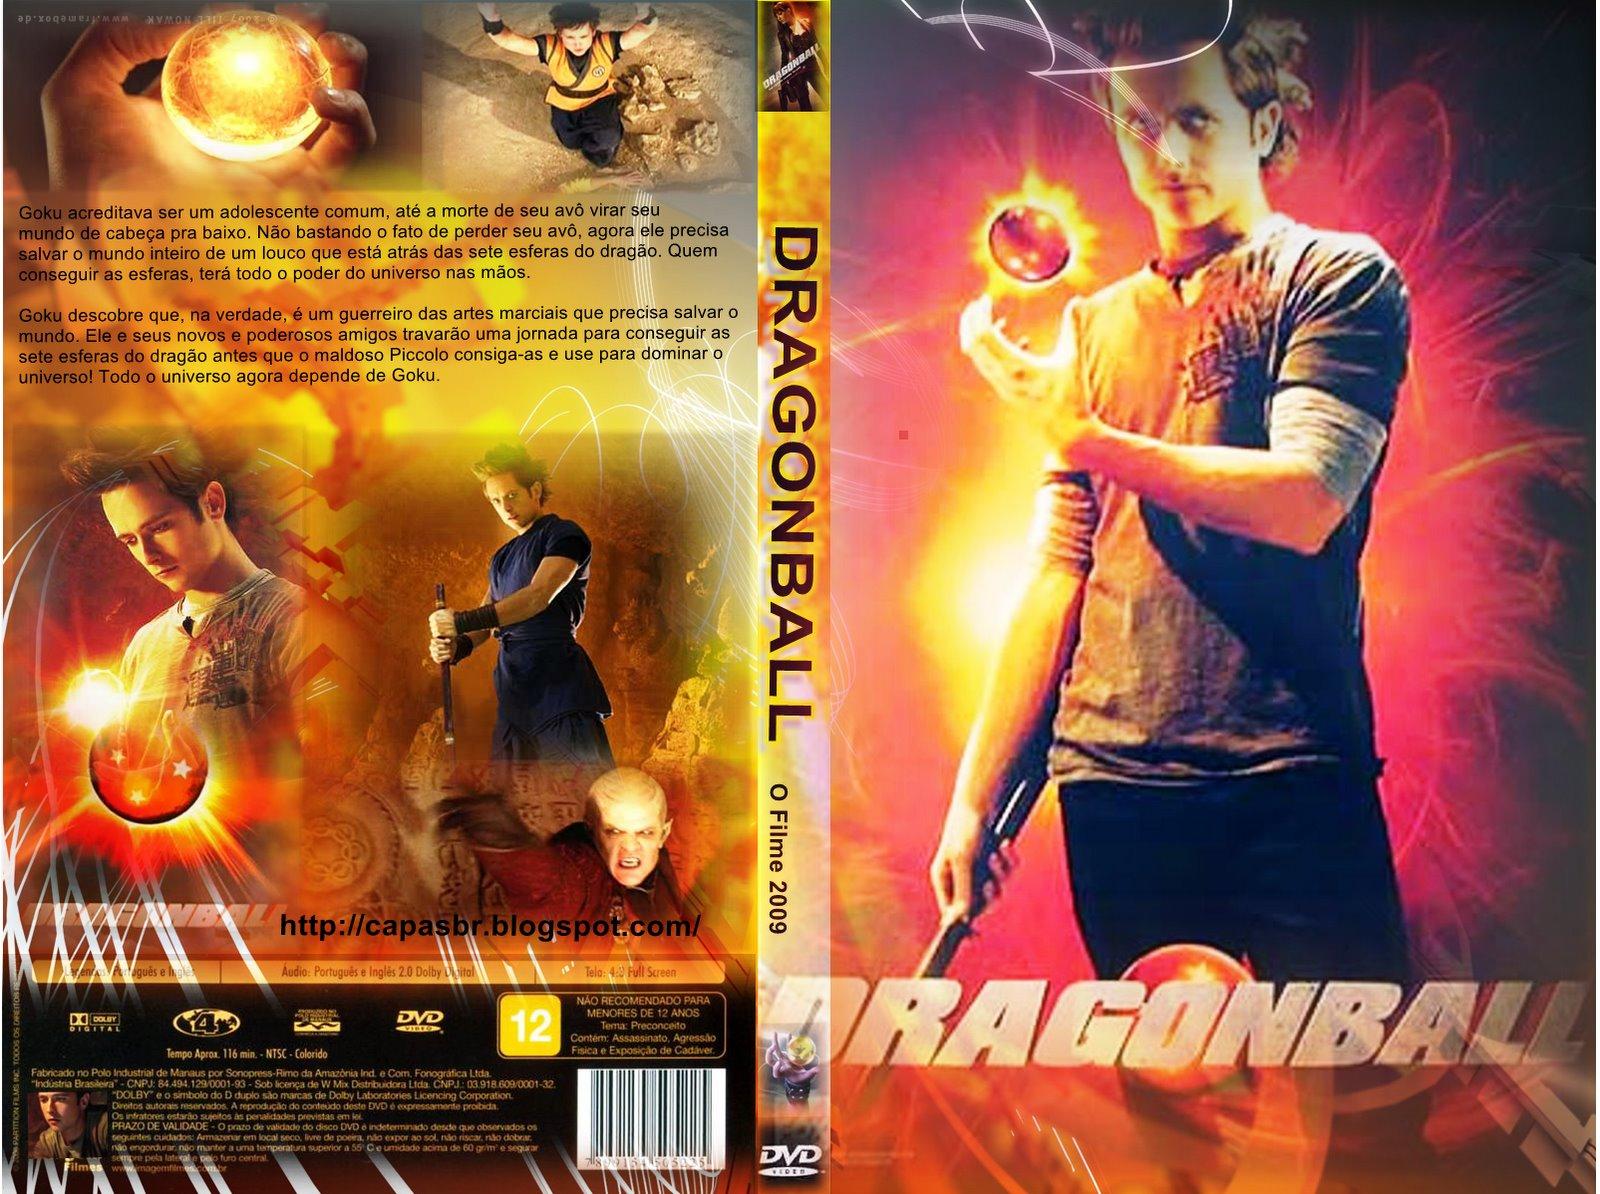 http://1.bp.blogspot.com/_6q6Cp3J4Jis/TO5RAaRH15I/AAAAAAAAA9M/3Nn81qXnxM0/s1600/Dragonball%2BZ%2B-%2Bo%2Bfilme.jpg